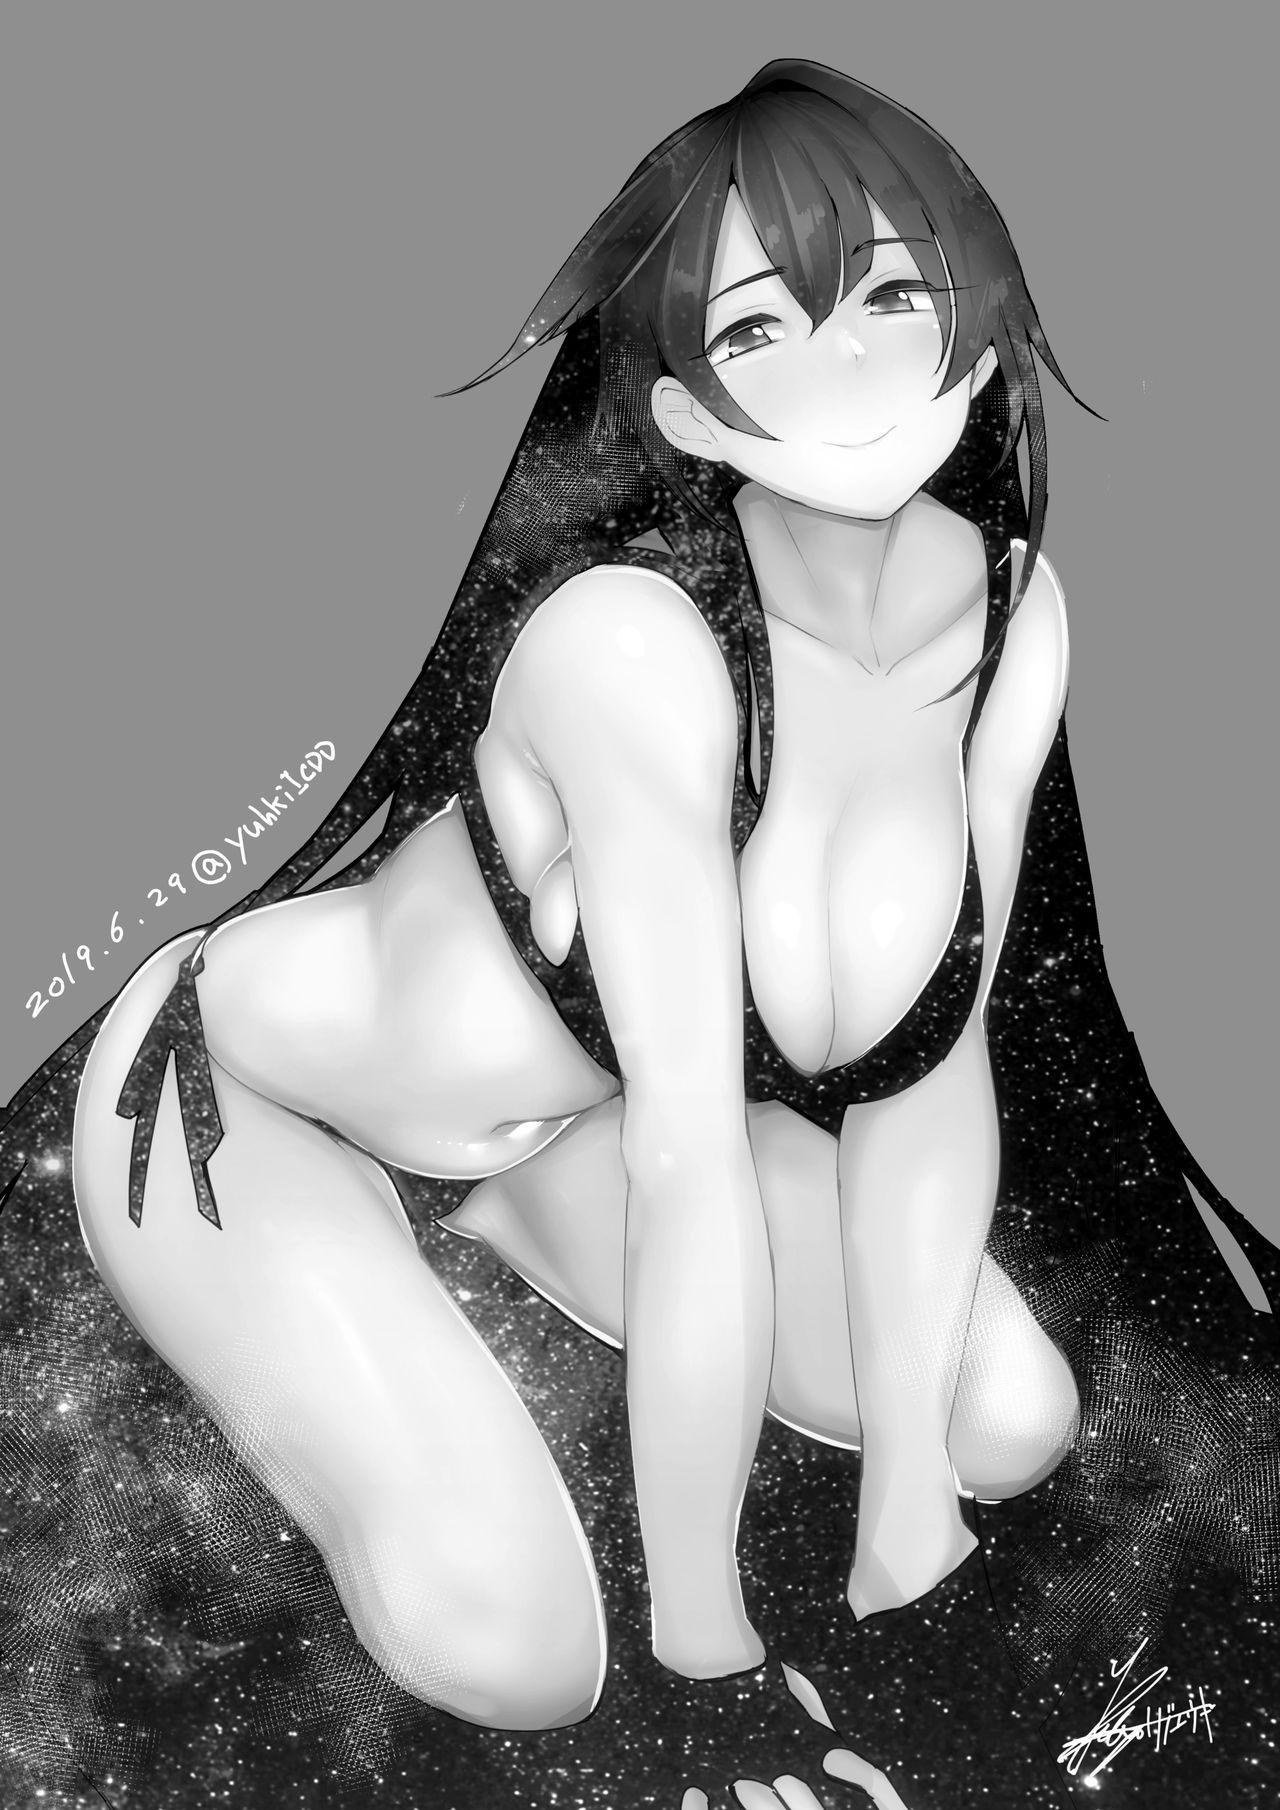 [L.G.C. (Rib:y(uhki))] Onee-chan wa Uchuu. - My elder sister is the universe. [English] {2d-market.com} [Decensored] [Digital] 18